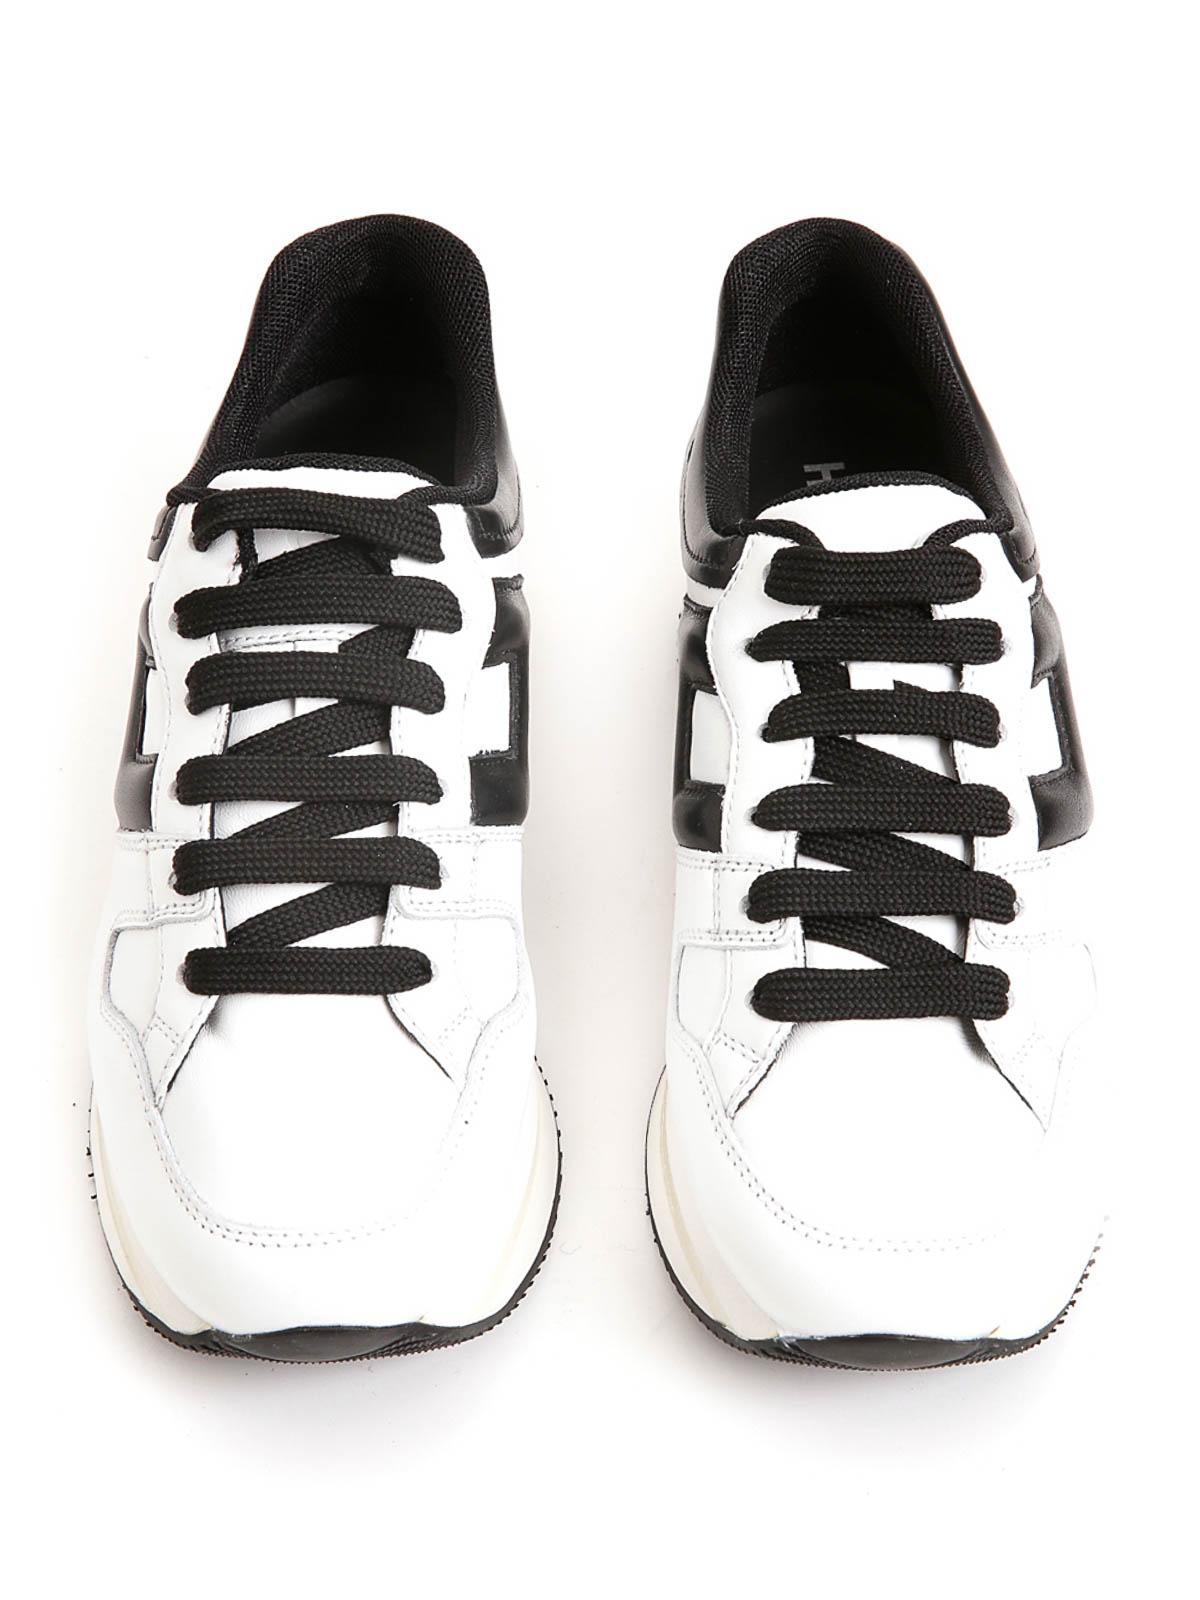 Trainers Hogan - H22 Casual sneakers - HXW220T540CSR002   iKRIX.com